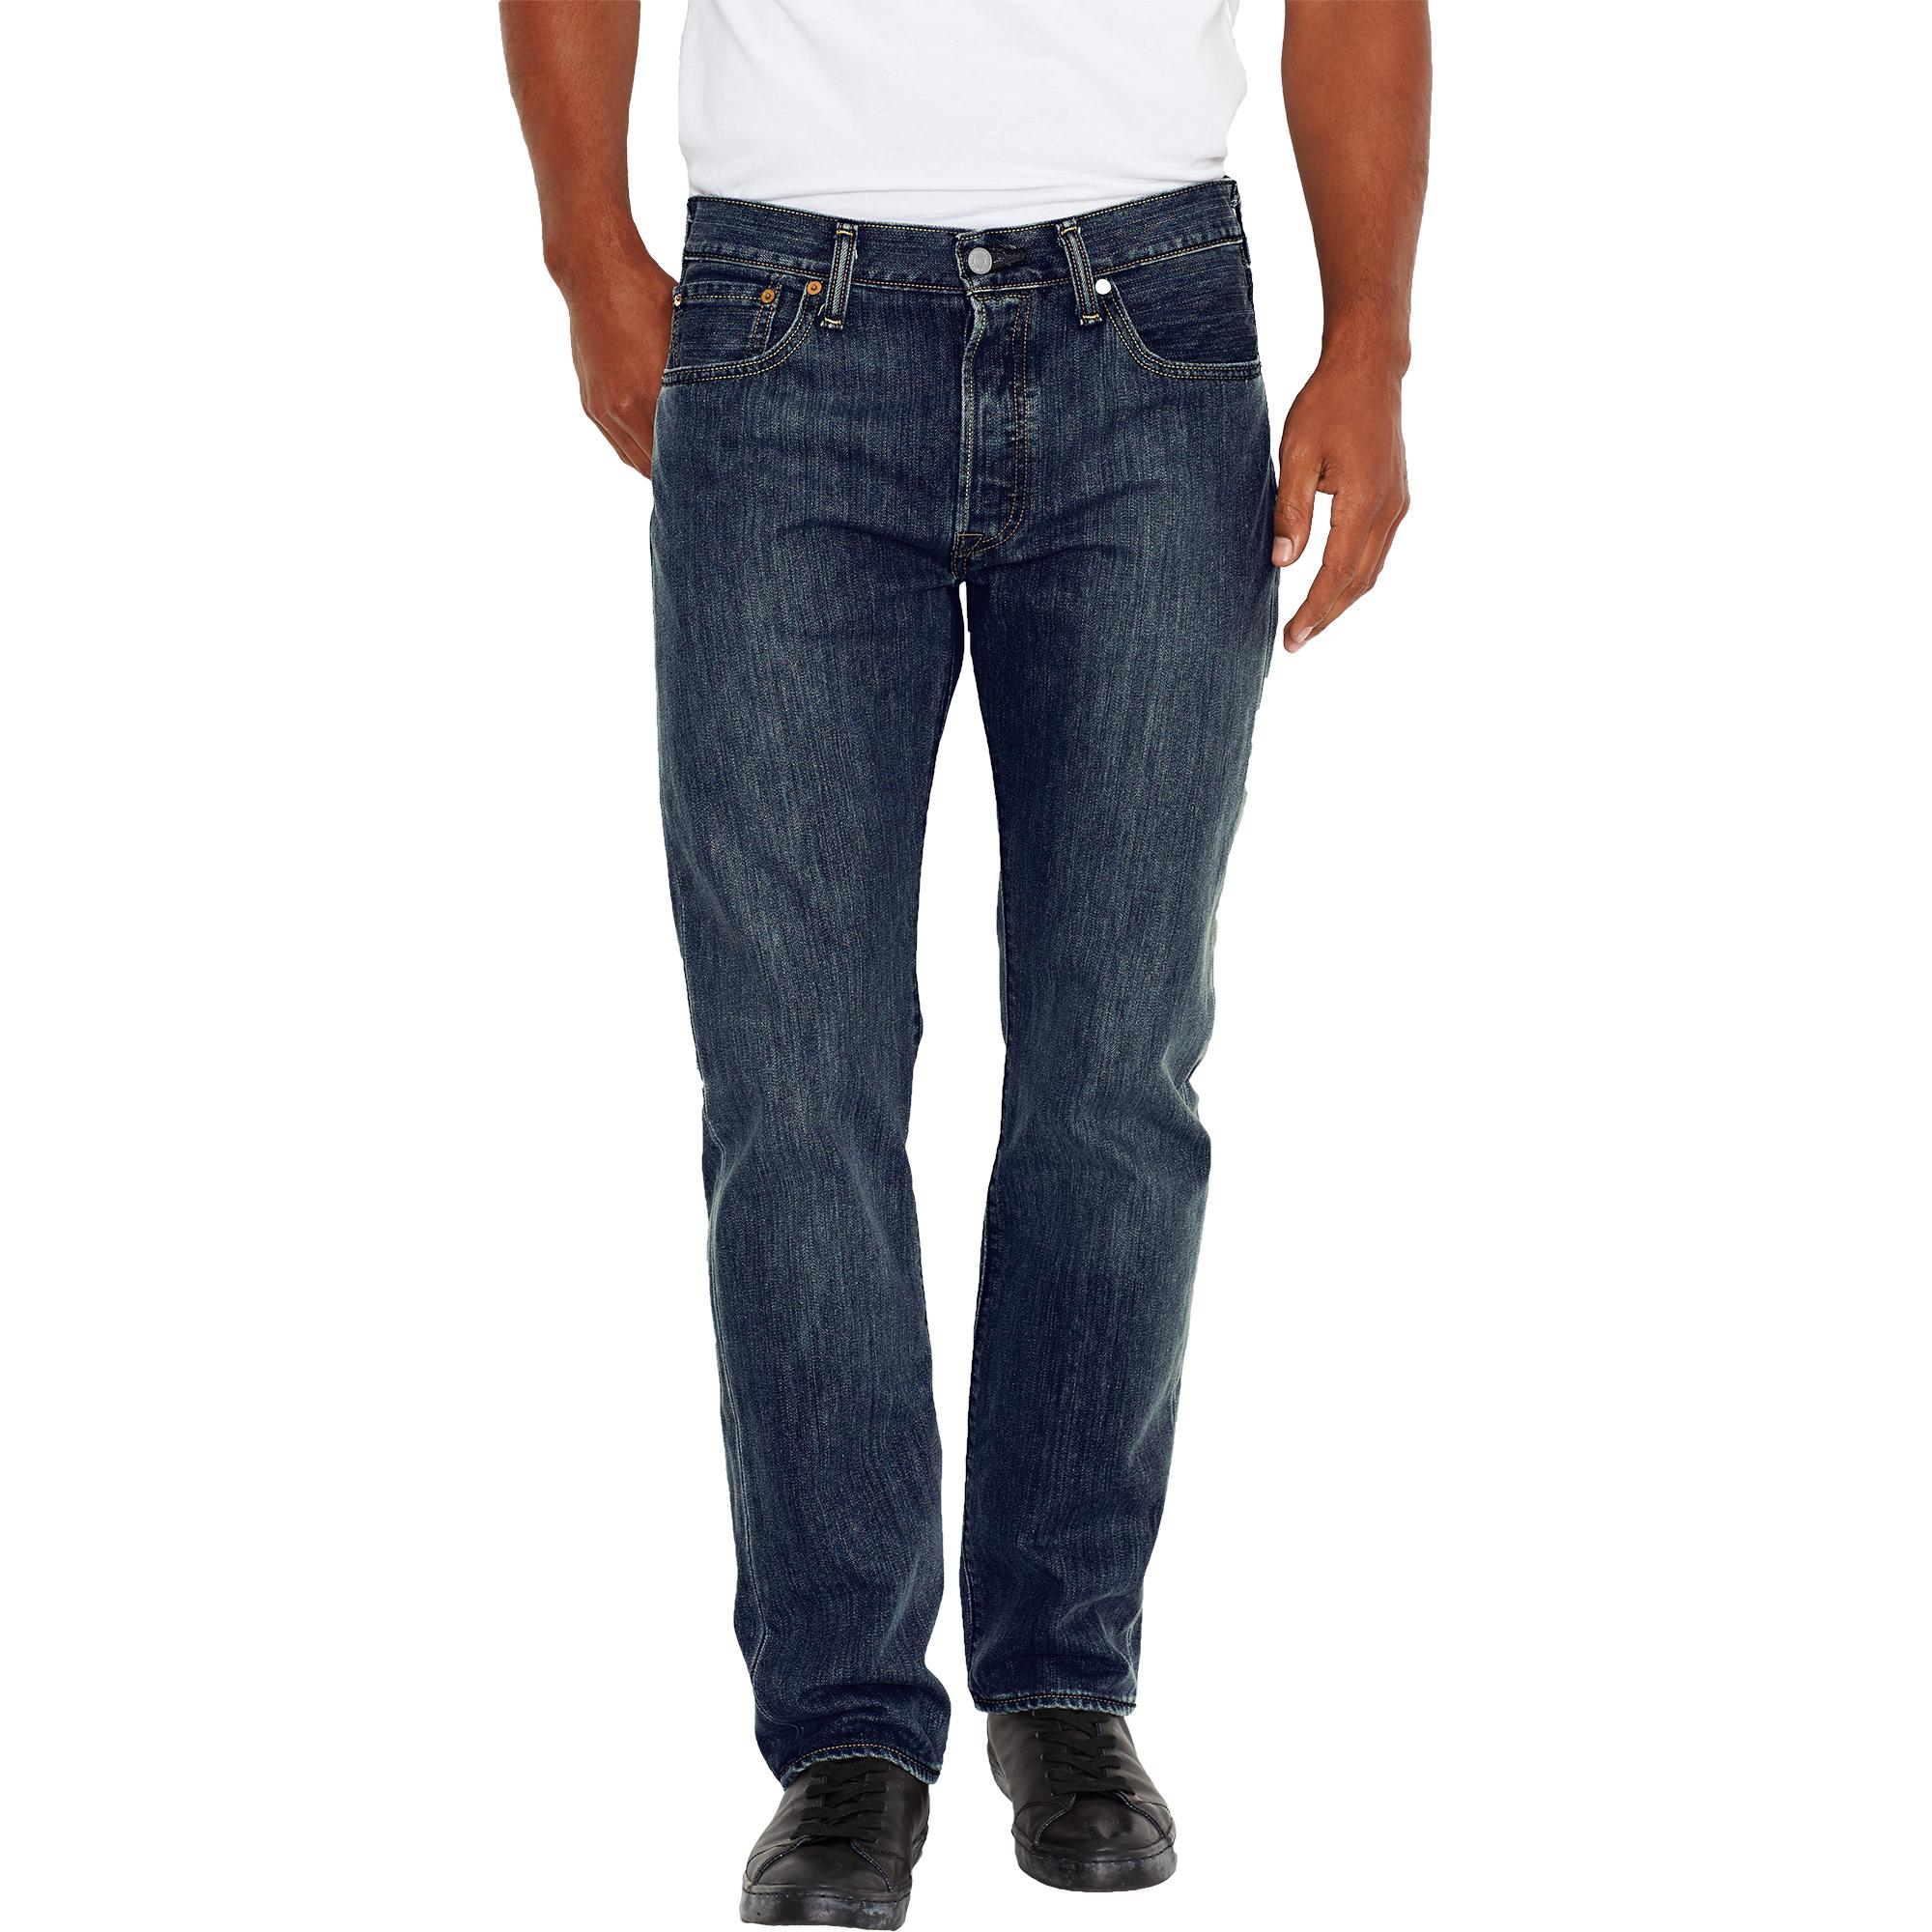 levi 39 s herren jeans 501 original straight fit dark clean. Black Bedroom Furniture Sets. Home Design Ideas